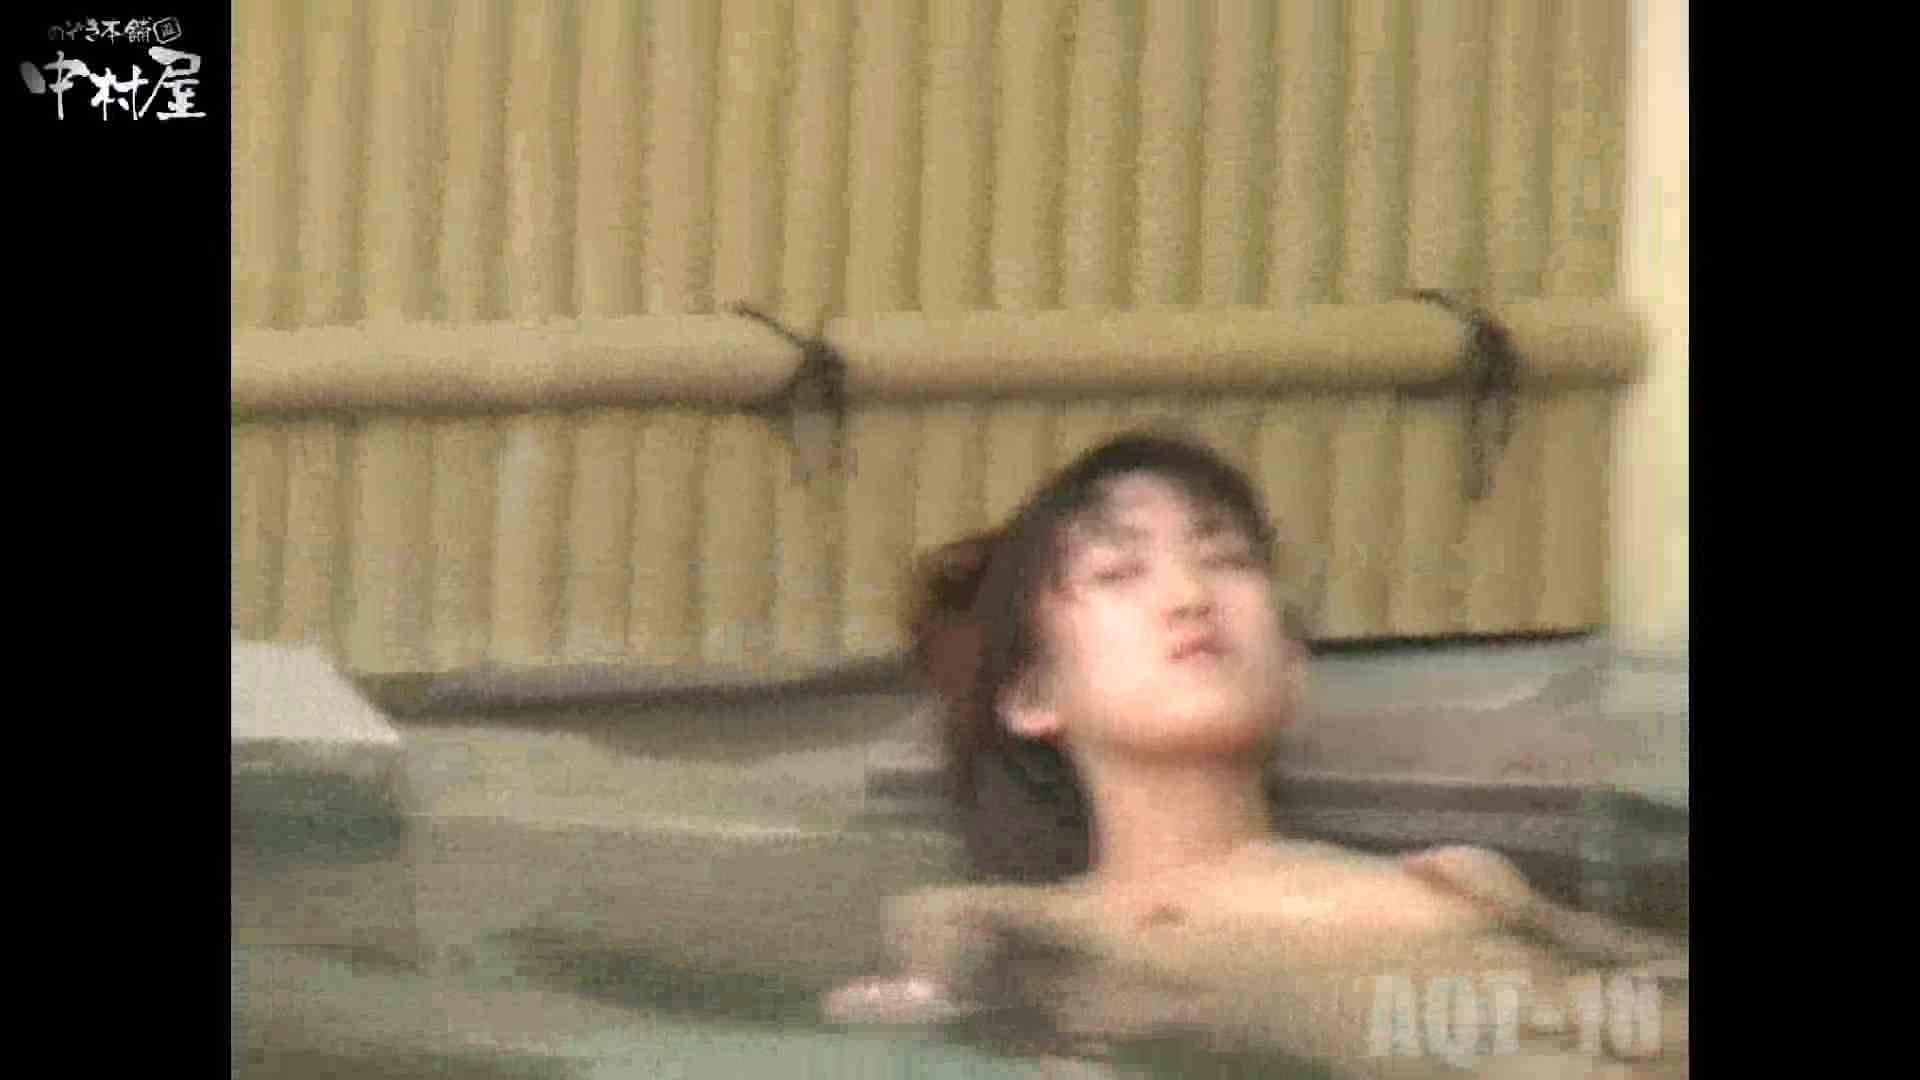 Aquaな露天風呂Vol.882潜入盗撮露天風呂十八判湯 其の七 露天   綺麗なOLたち  80枚 53